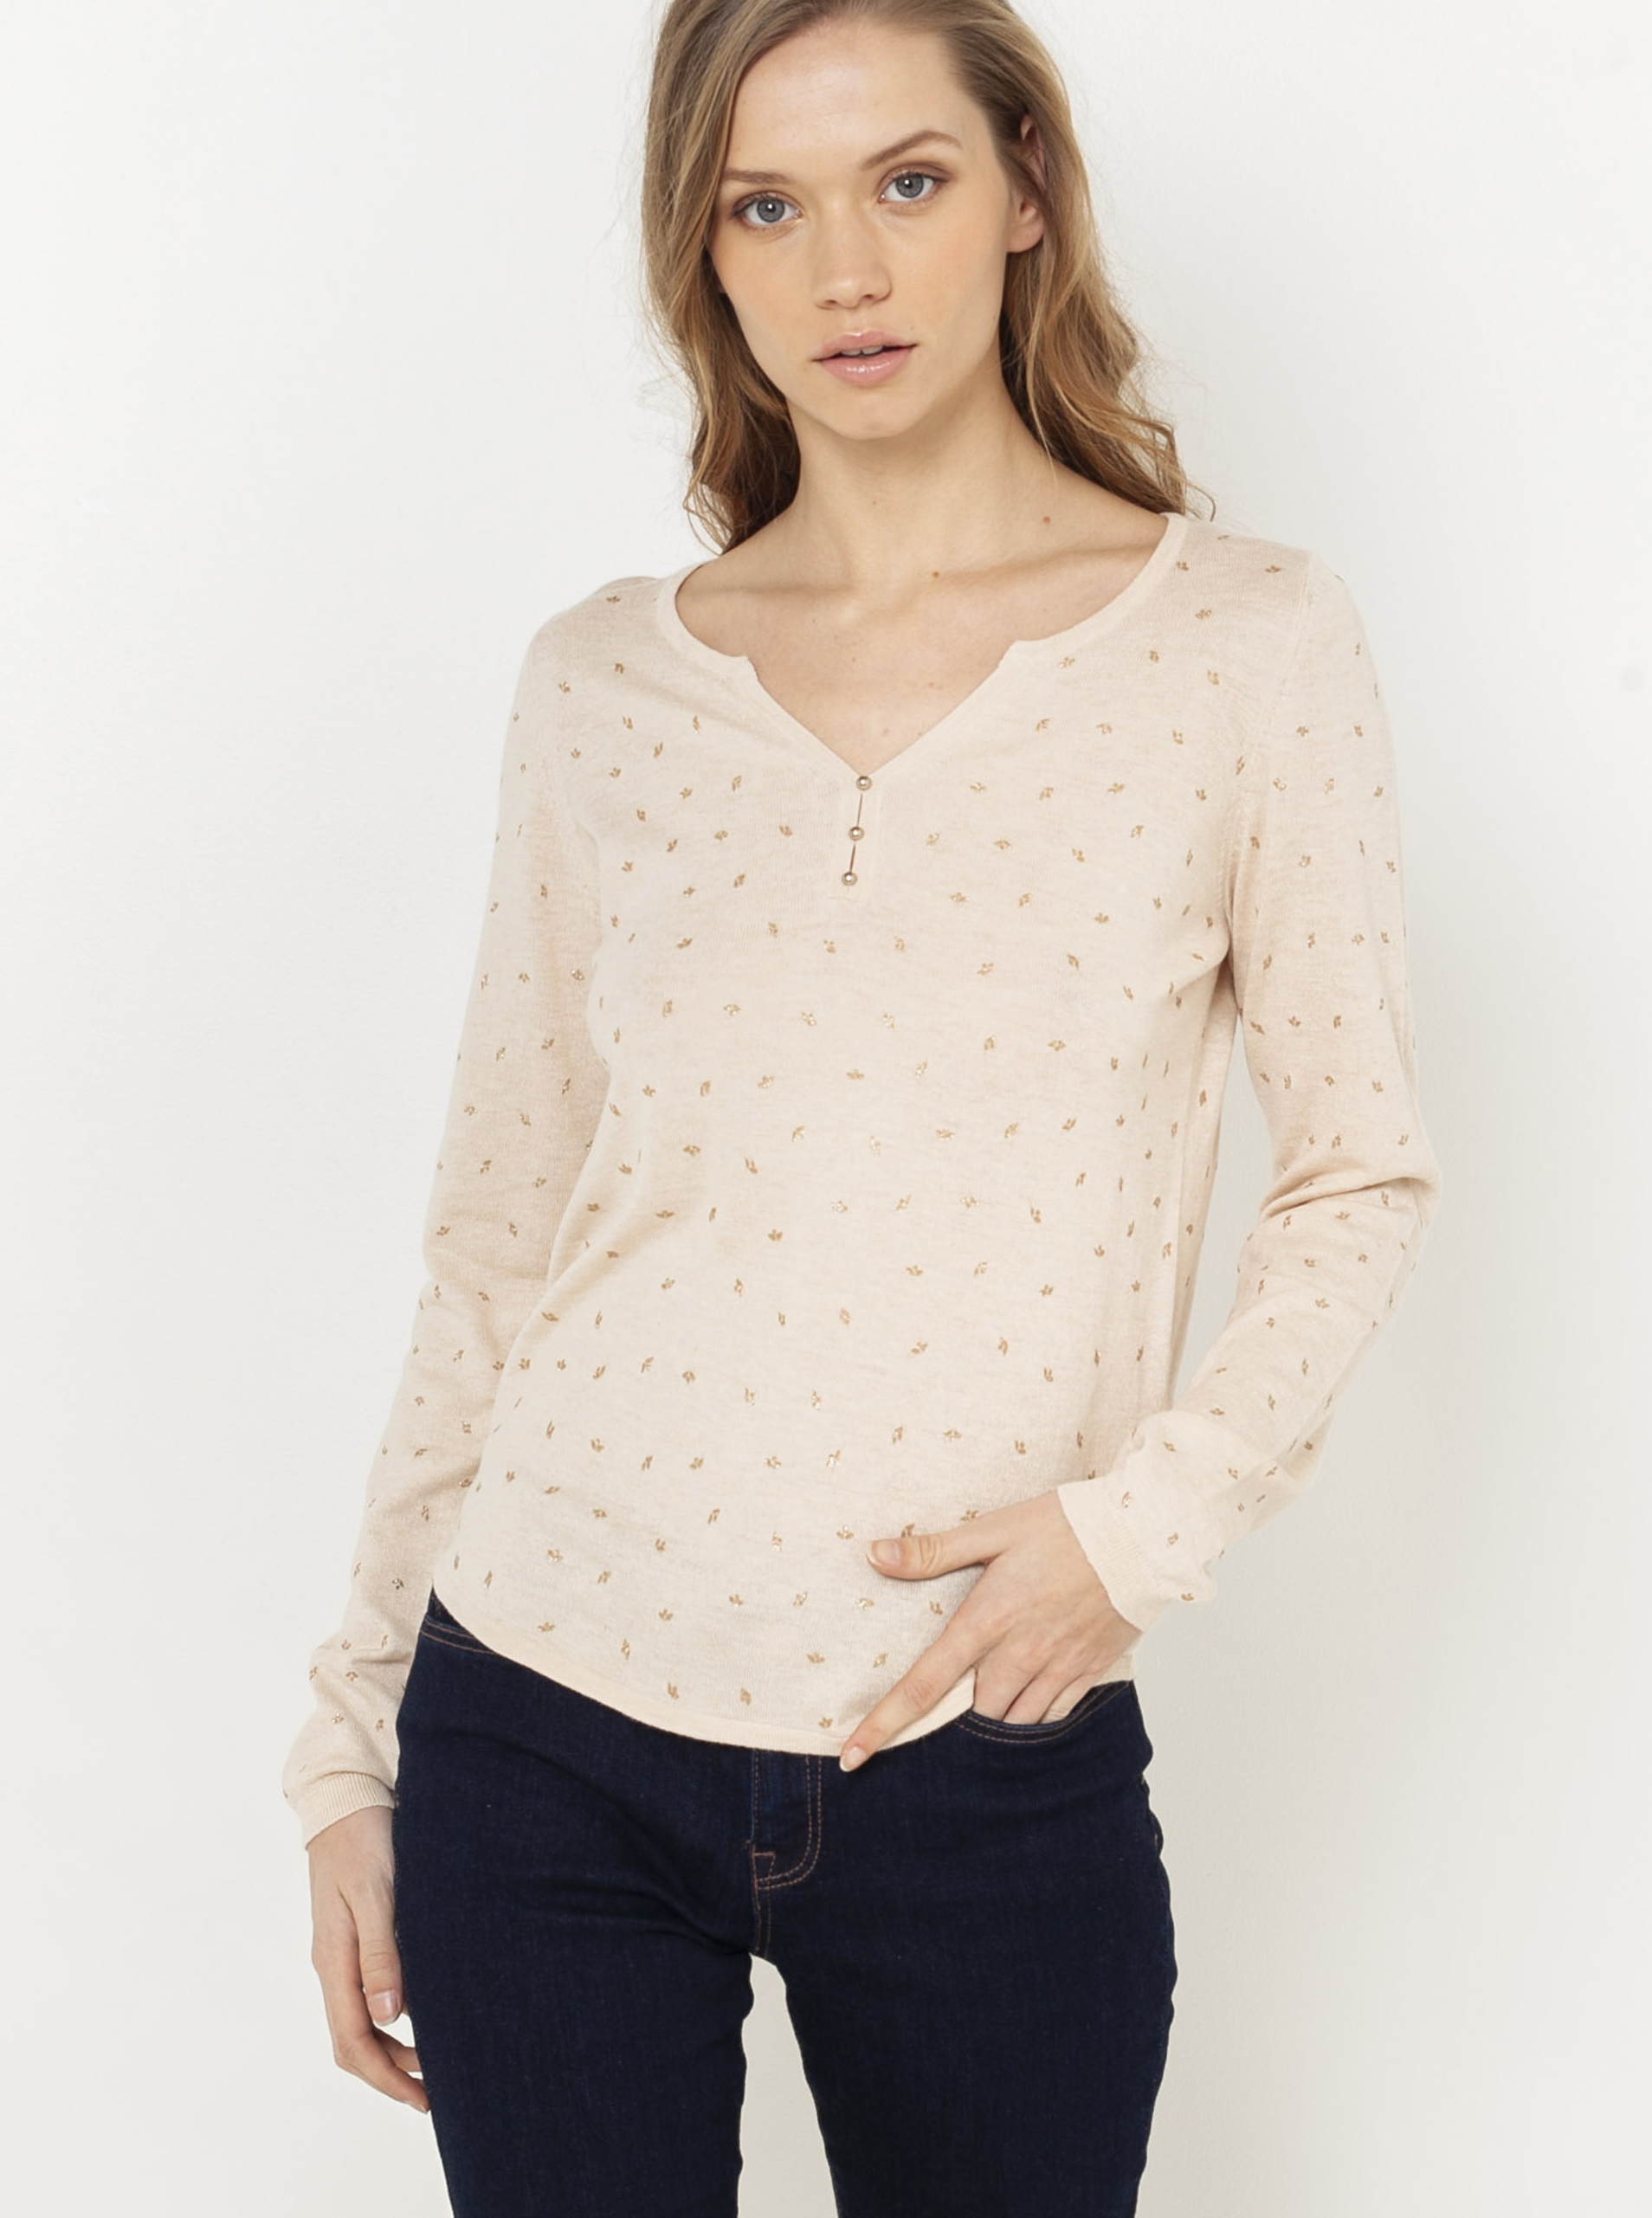 CAMAIEU beige maglietta con motivo